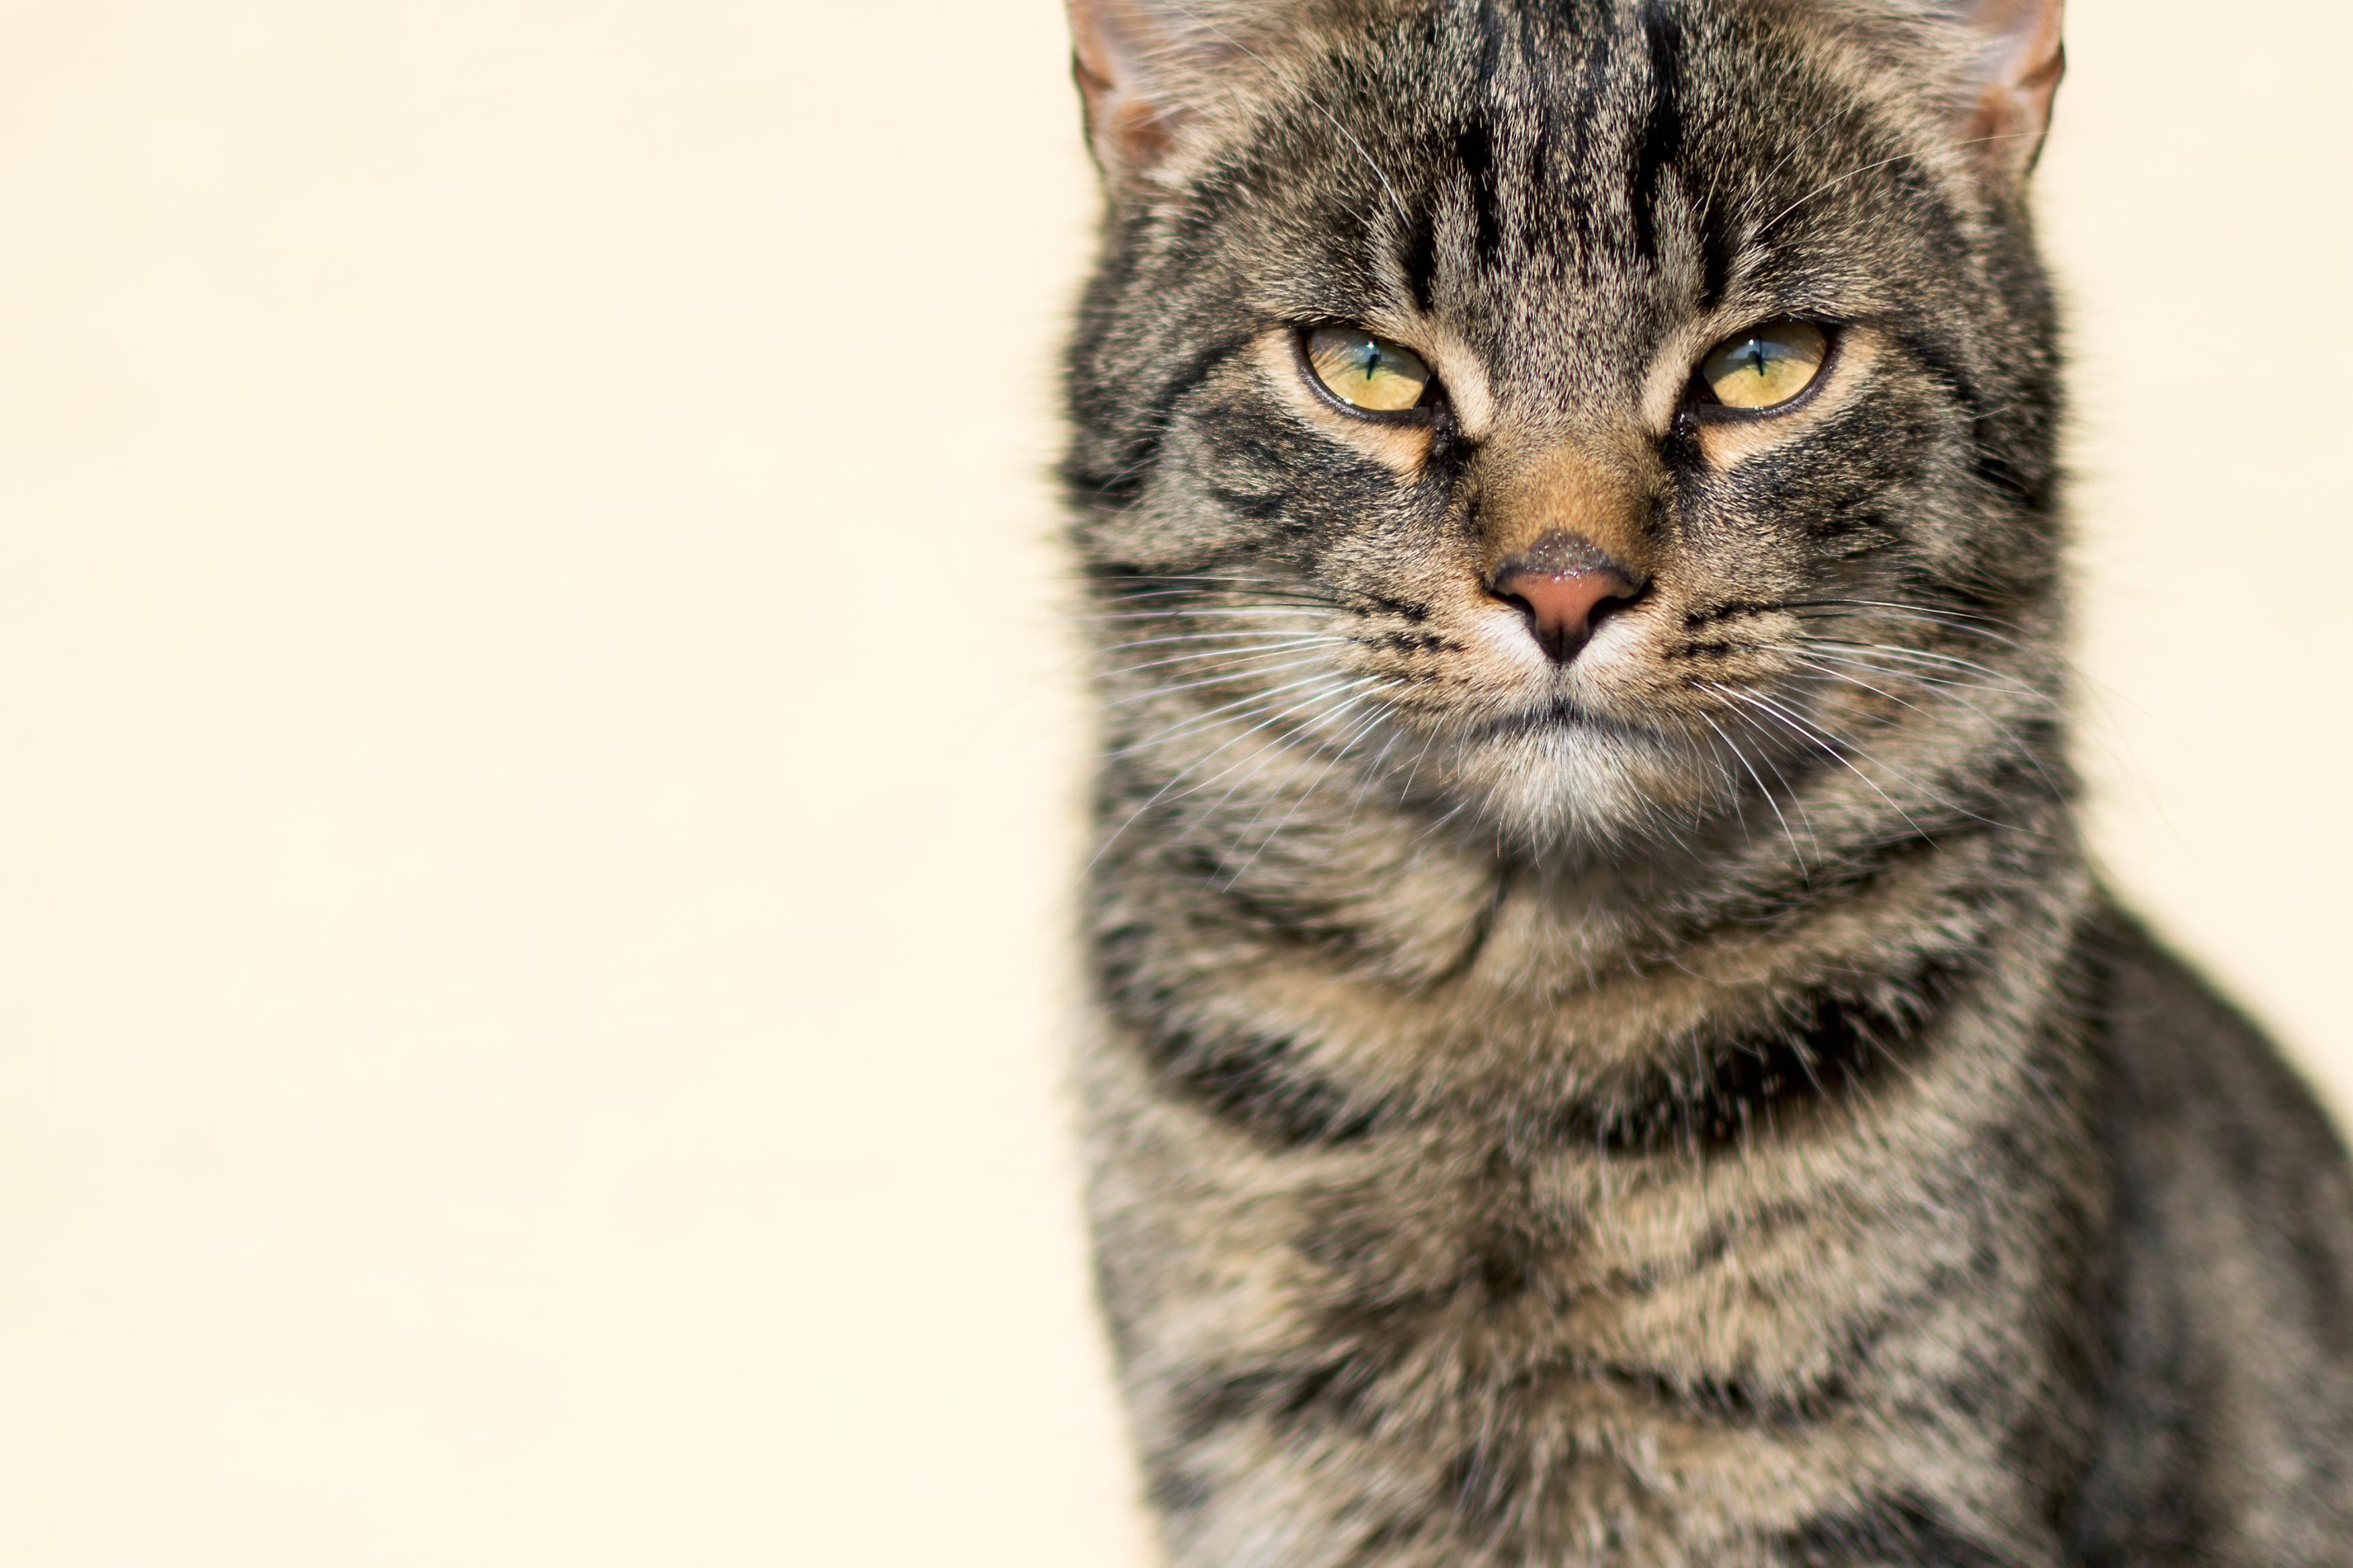 Wise Cat Portrait Free Stock Photo Libreshot